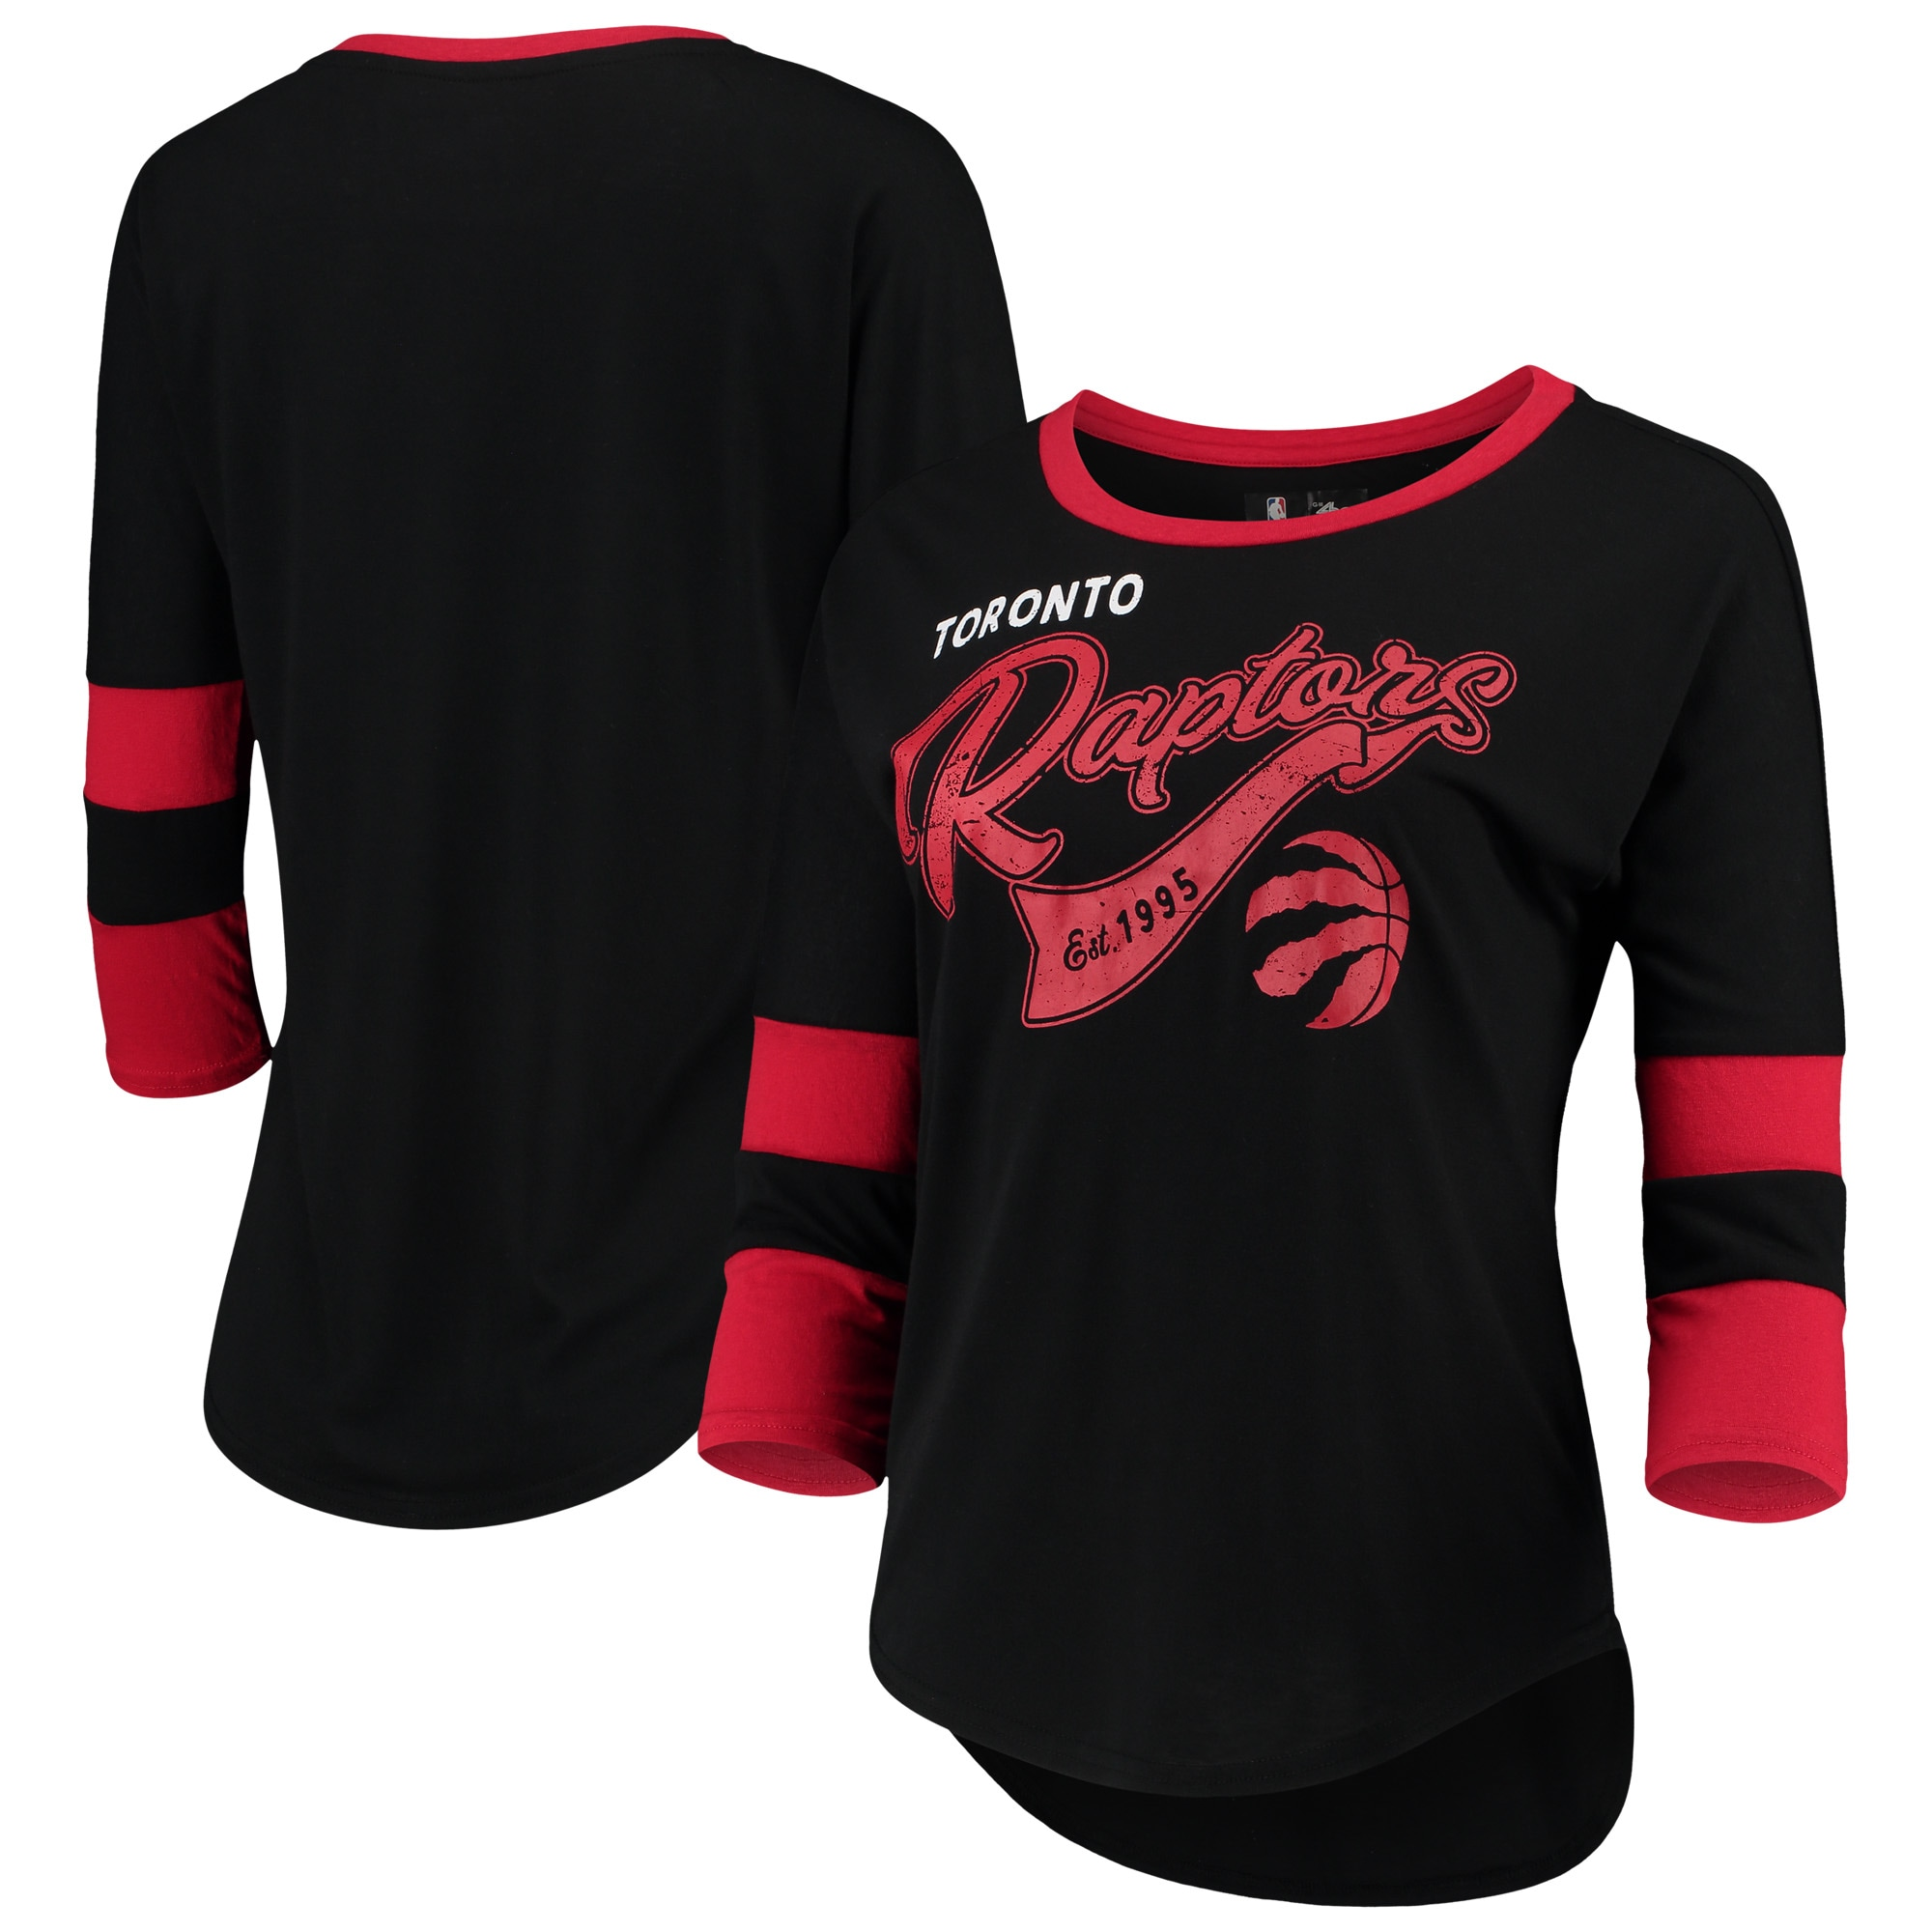 Toronto Raptors G-III 4Her by Carl Banks Women's Game Changer Viscose Jersey 3/4-Sleeve T-Shirt - Black/Red